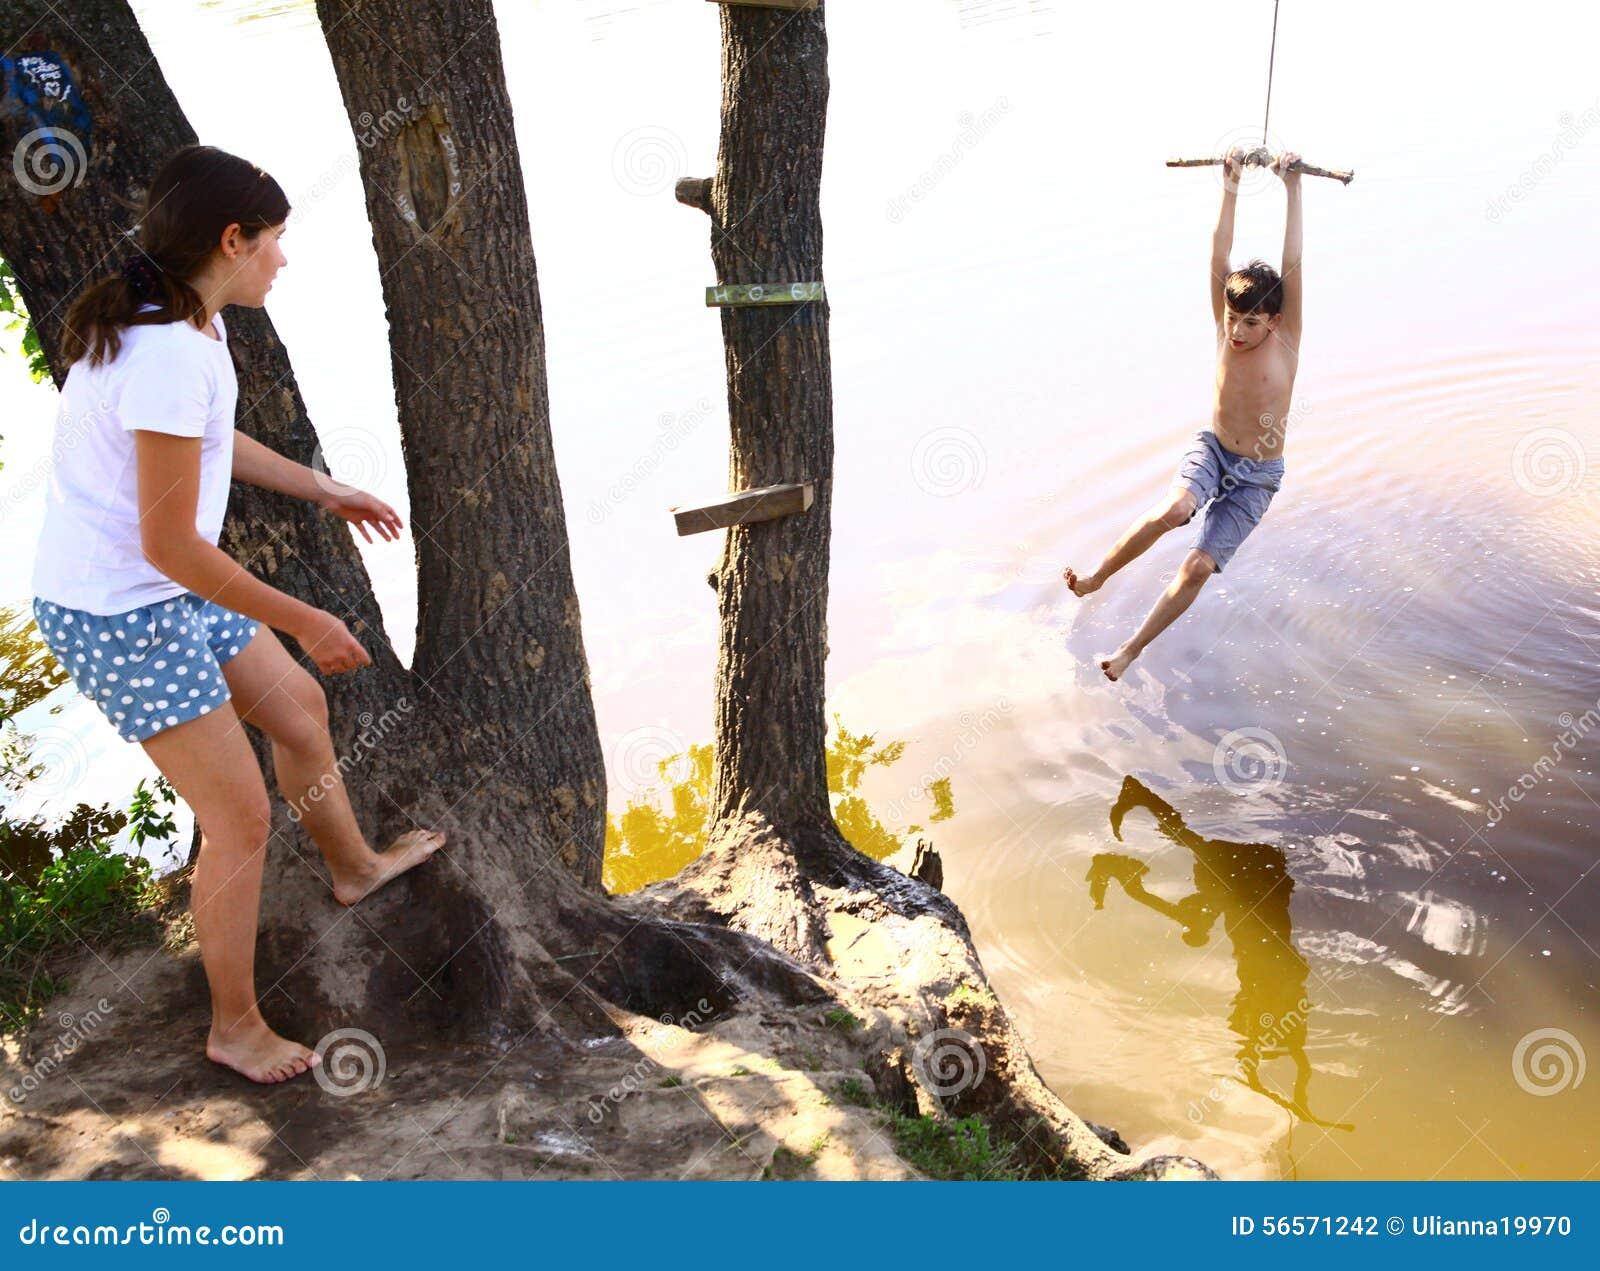 Download ο αδελφός και η αδελφή αμφιθαλών διασκεδάζονται με την ταλάντευση νερού στις διακοπές Στοκ Εικόνες - εικόνα από δροσίστε, παιδί: 56571242